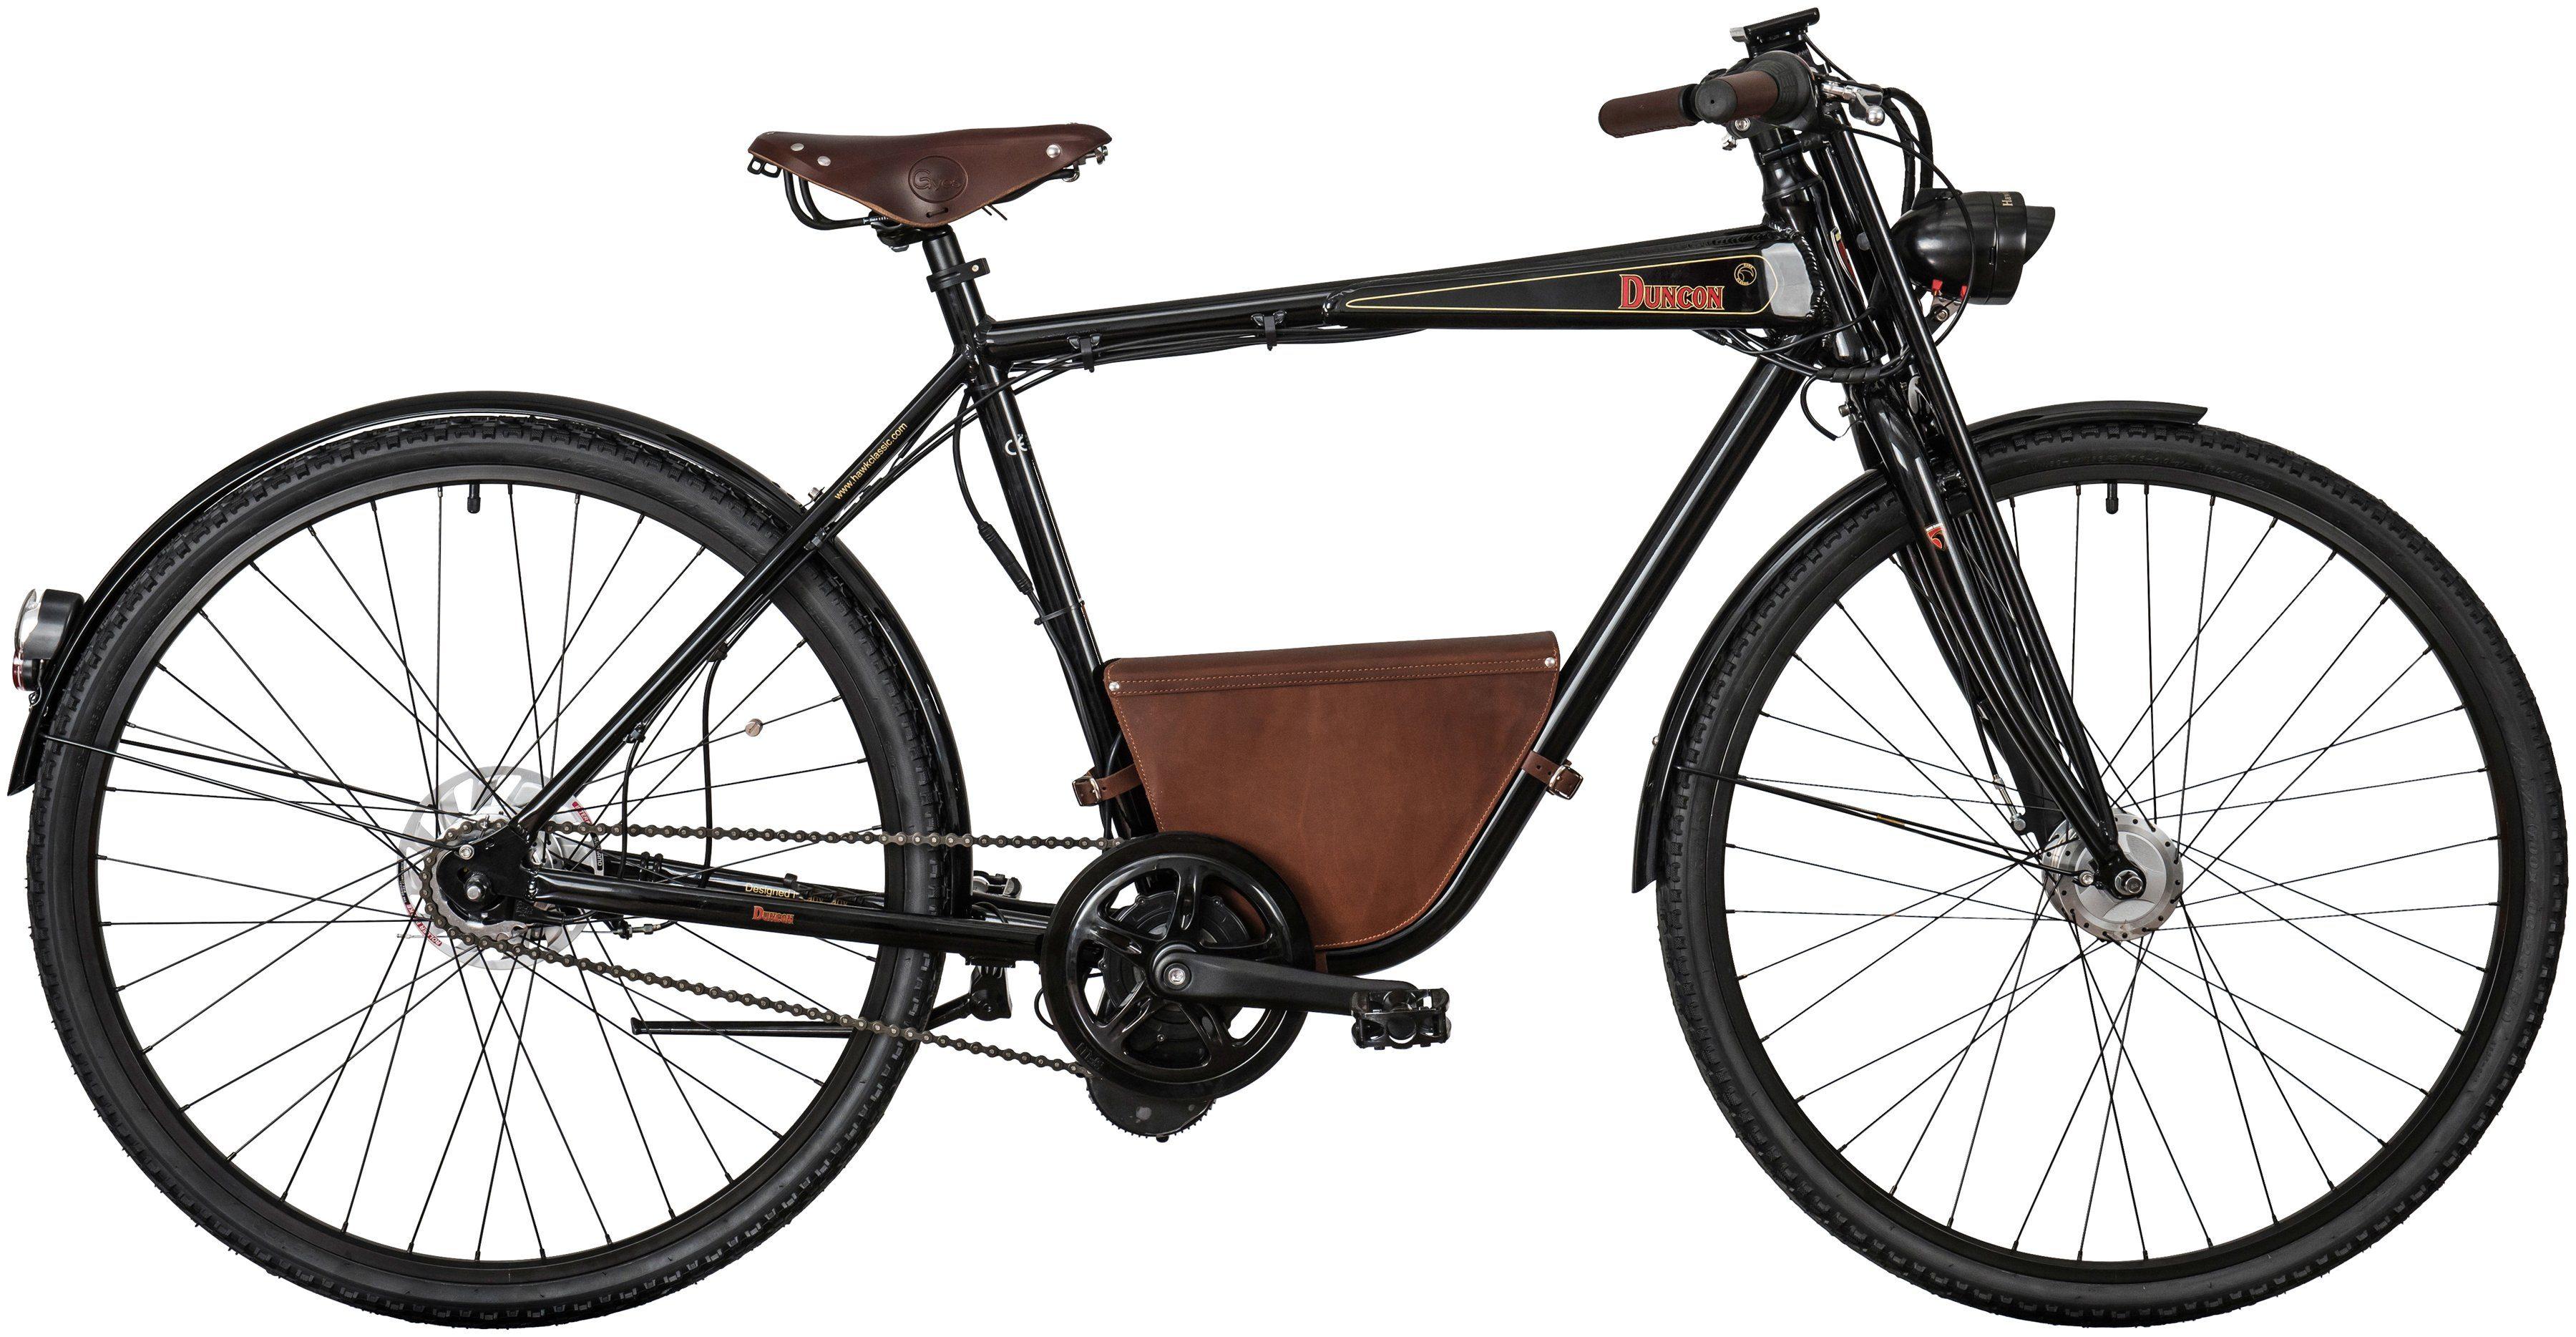 Hawk E-Bike City Herren »Duncon«, 28 Zoll, 7 Gang, Mittelmotor, 482 Wh